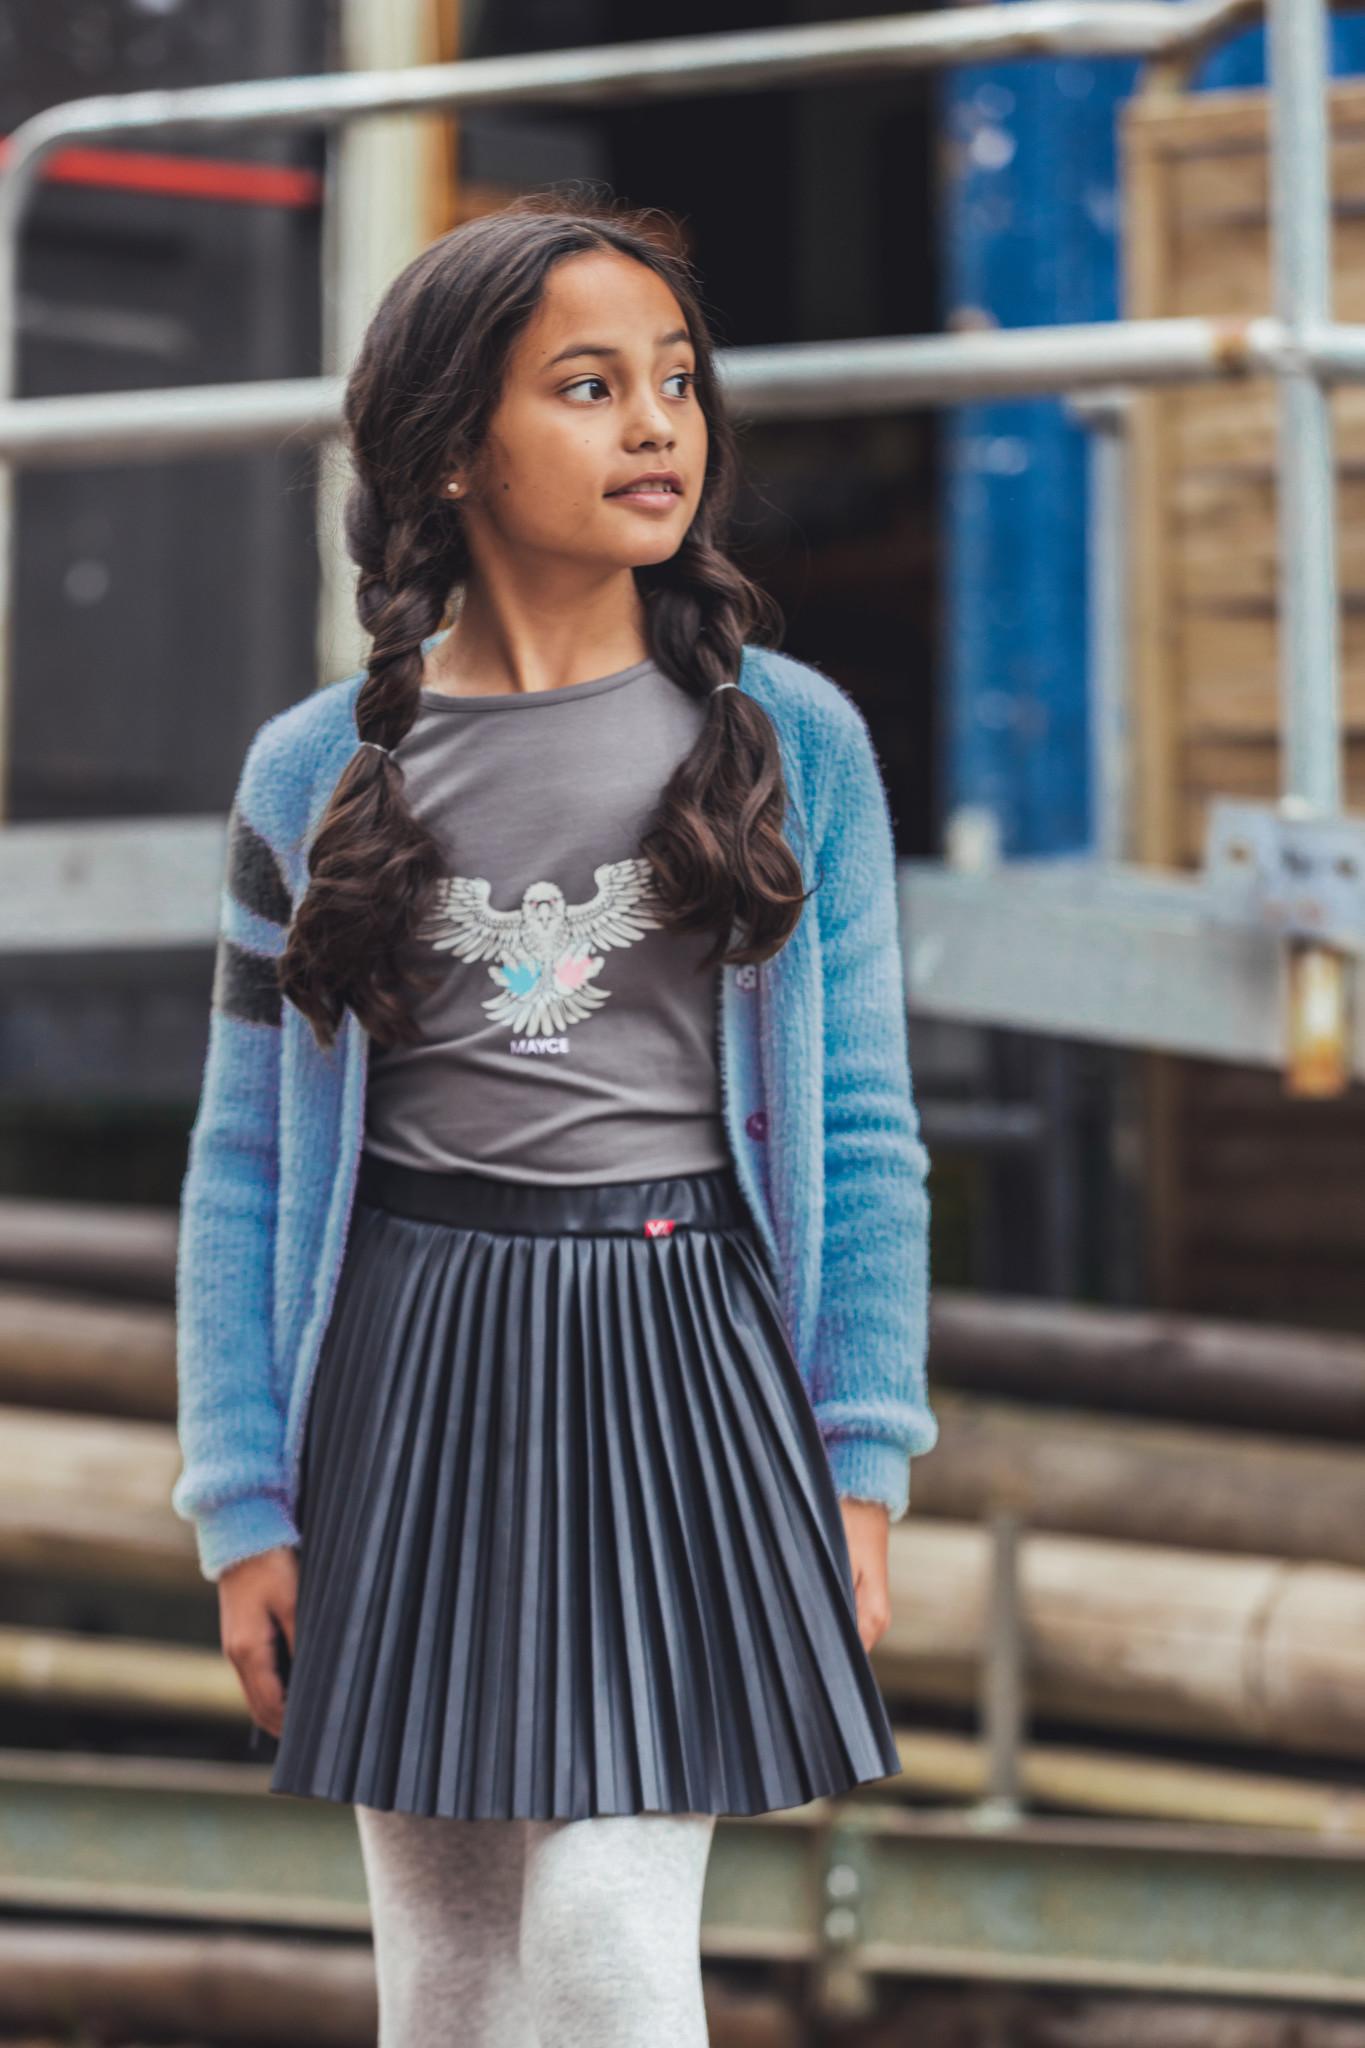 Mayce Girlslabel lookbook winter 2022-60